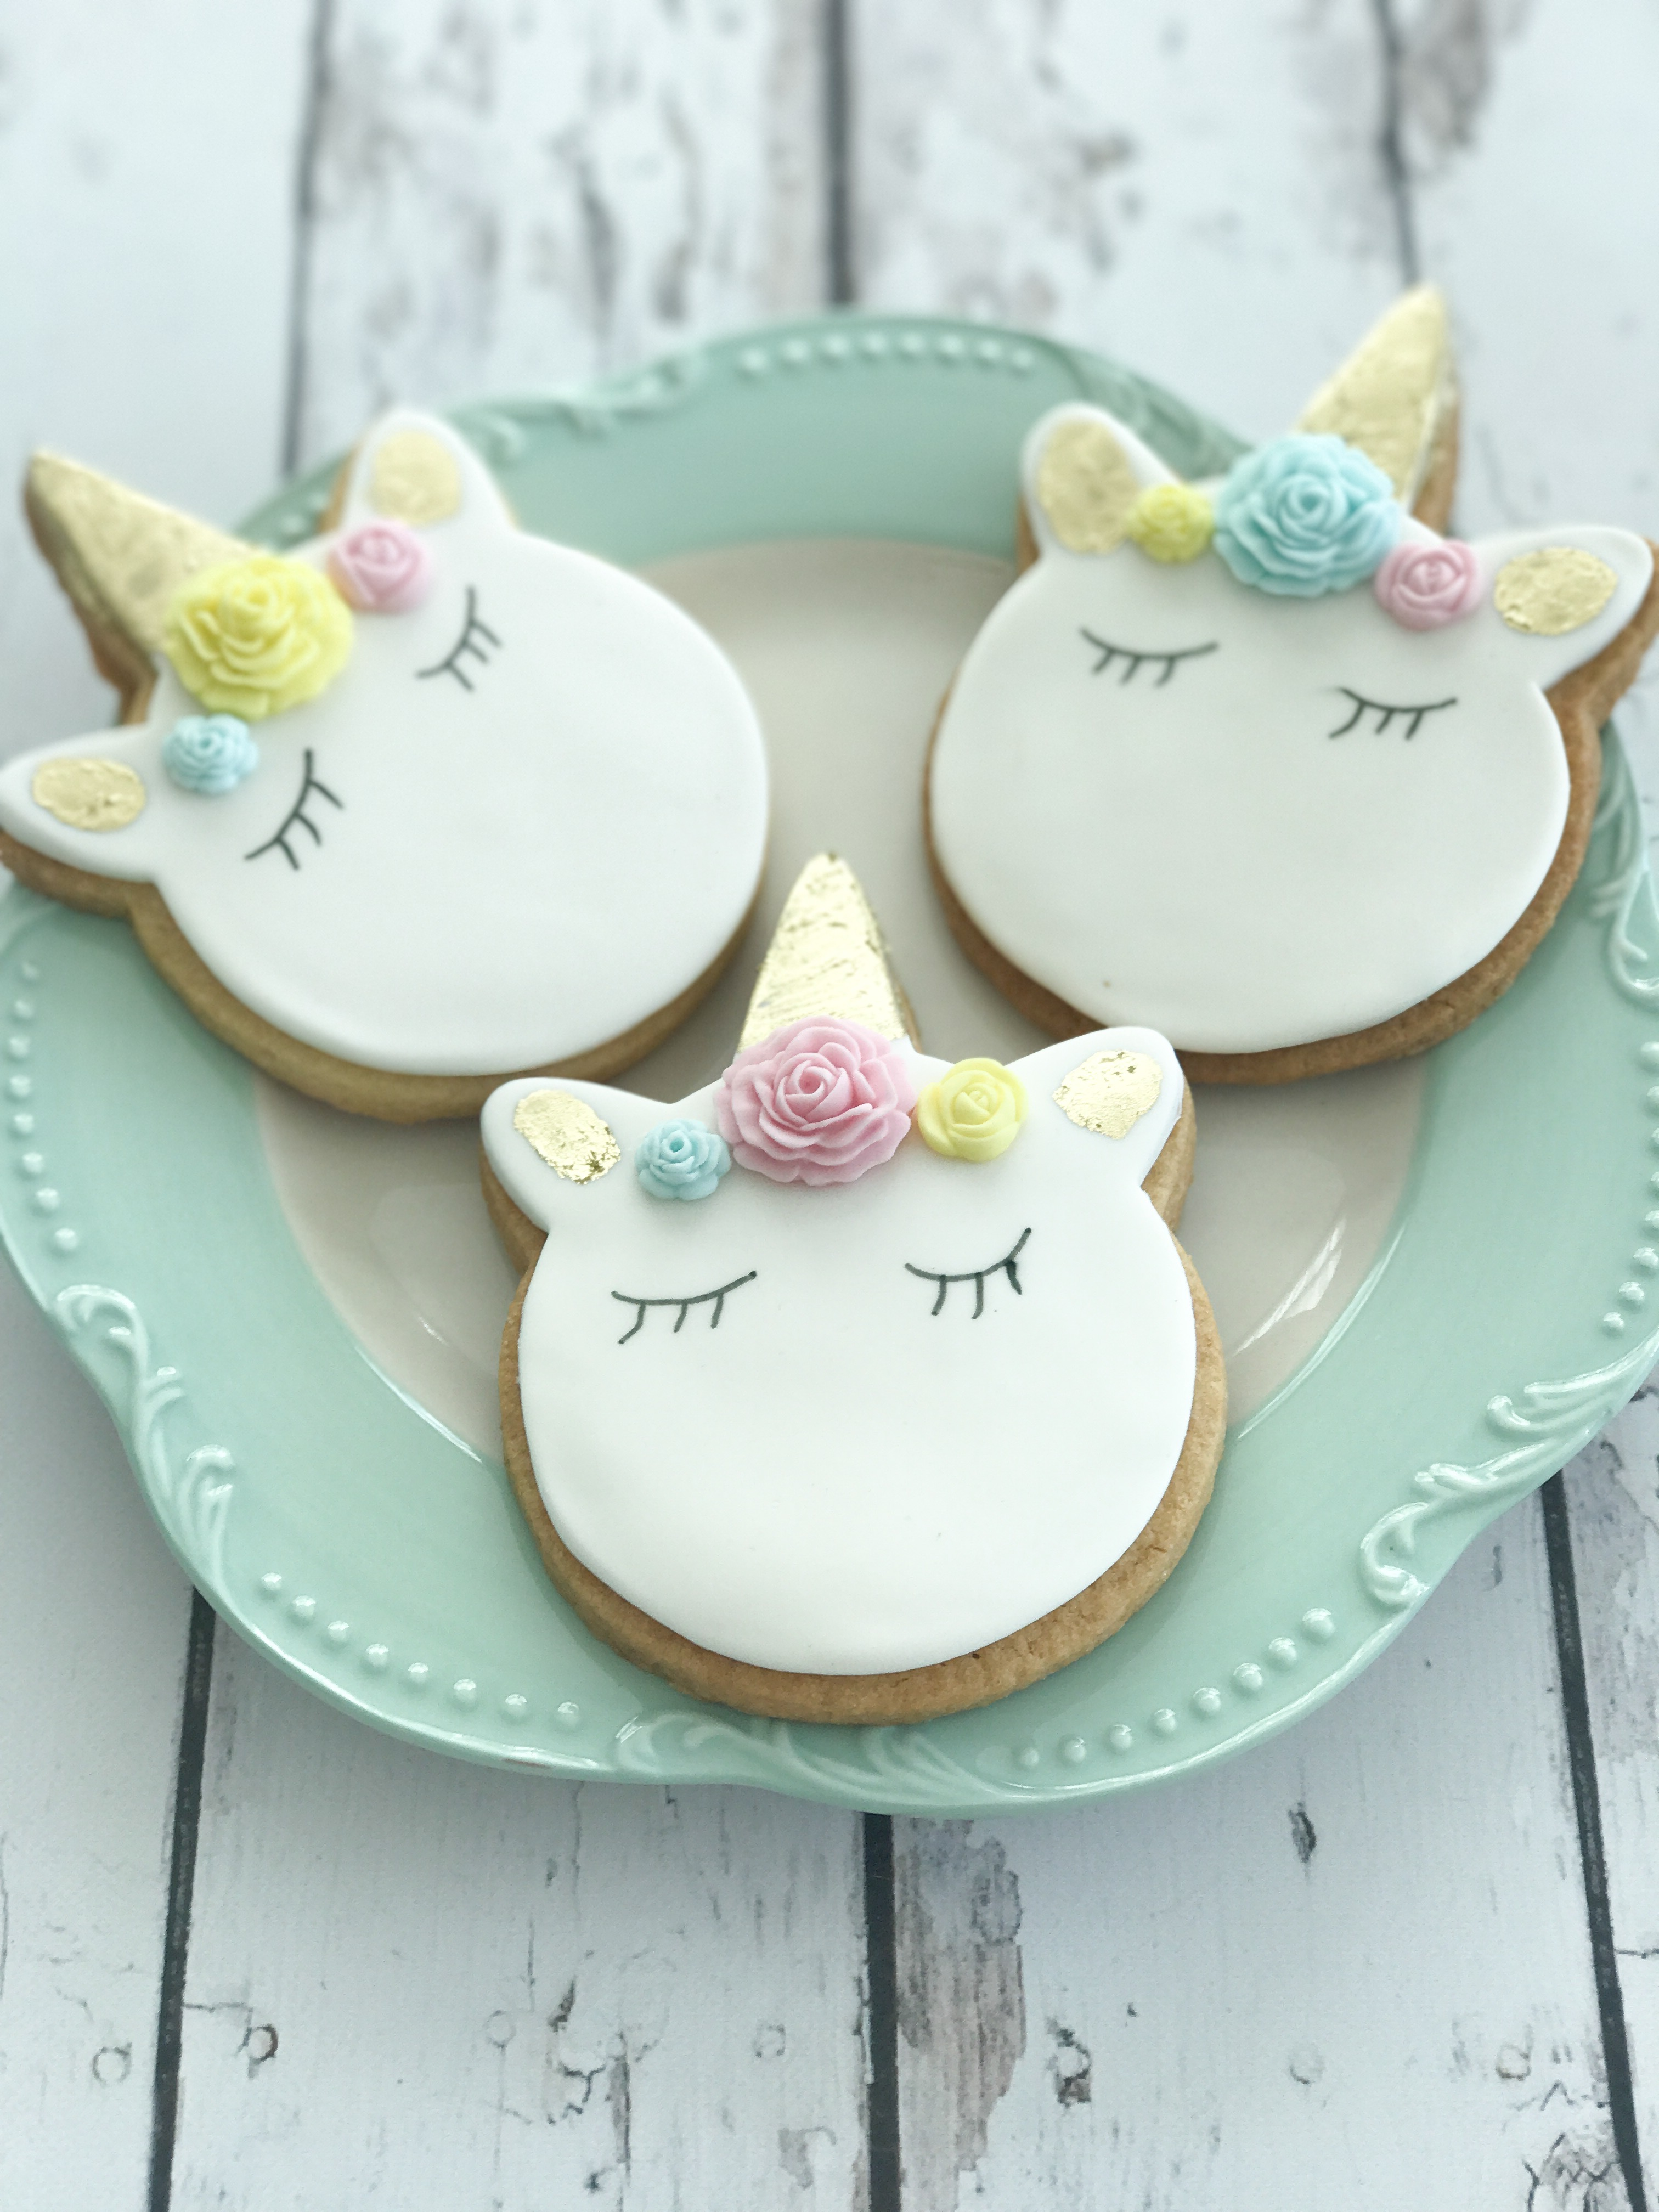 White fondant unicorn cookies